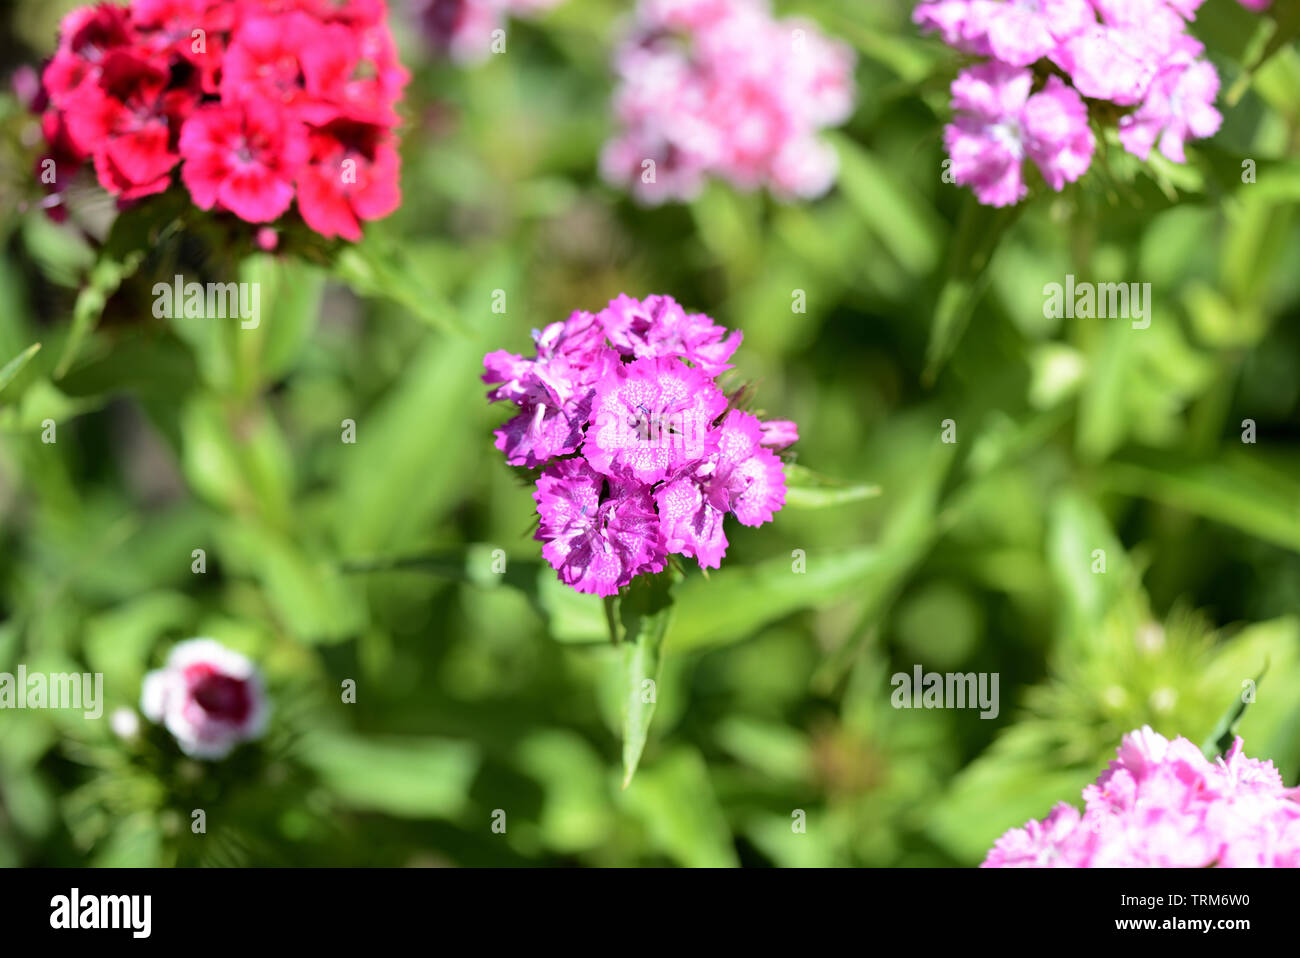 Sweet william flowers (Dianthus barbatus) in the summer garden close up - Stock Image